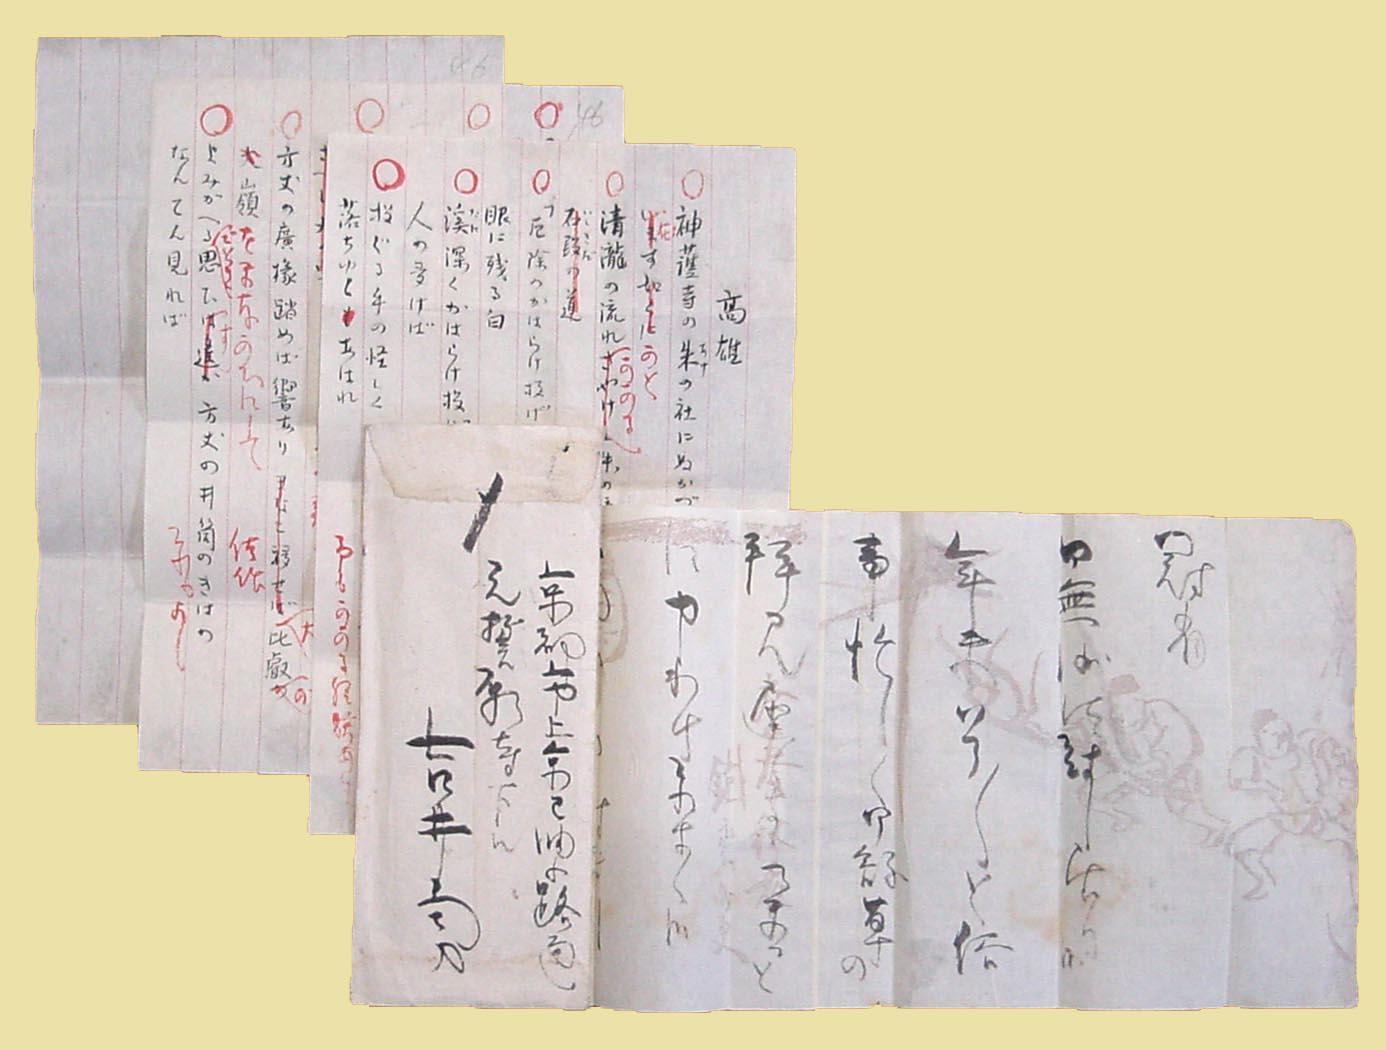 五山堂書店, GOZANDO BOOKS, INC...